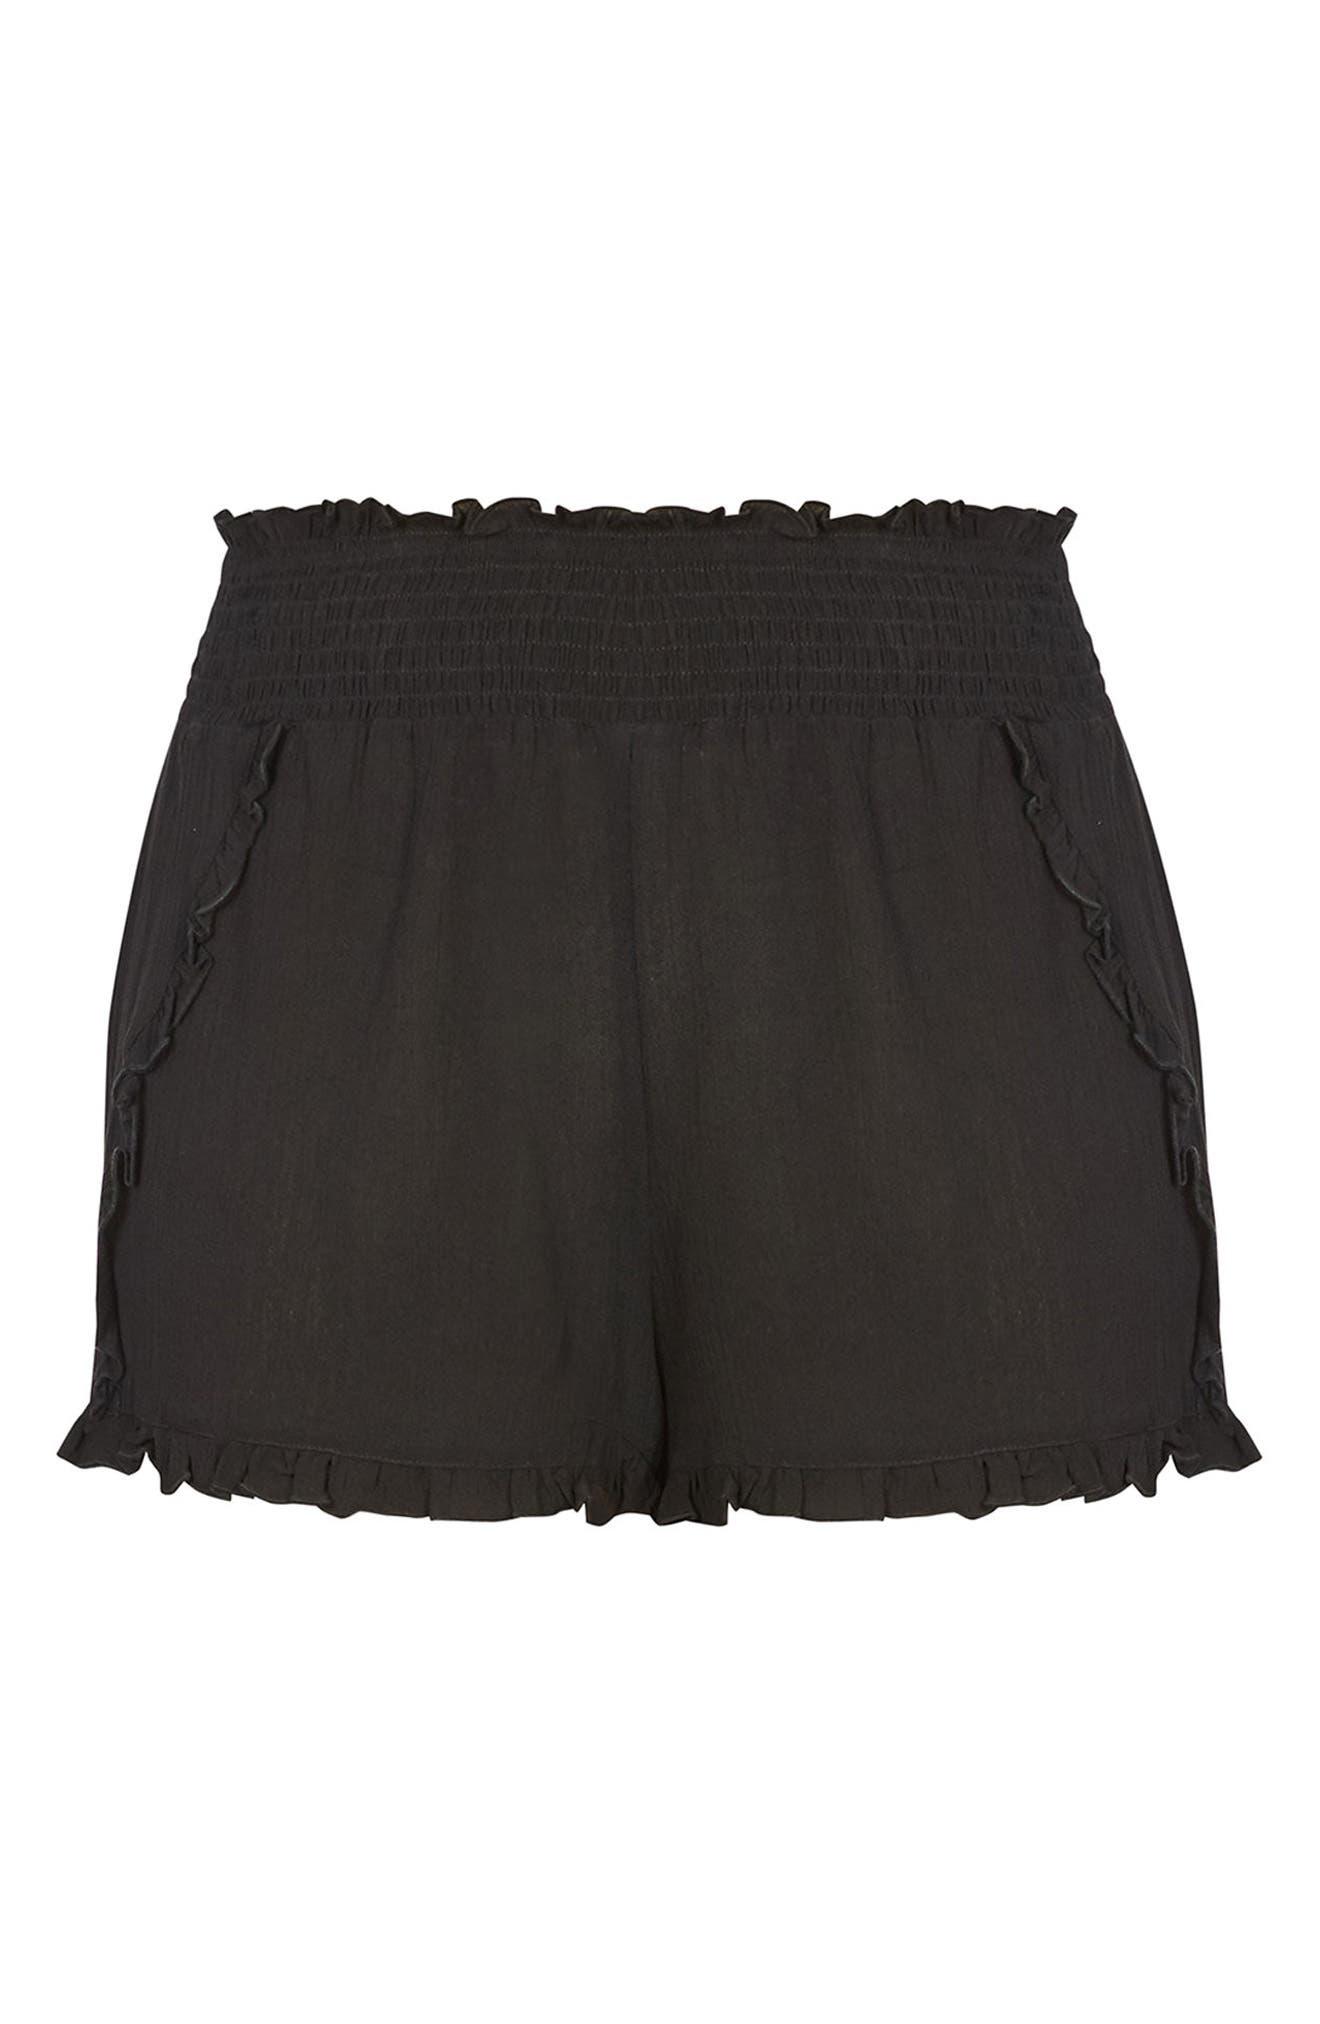 Island Holiday Shorts,                             Alternate thumbnail 4, color,                             BLACK